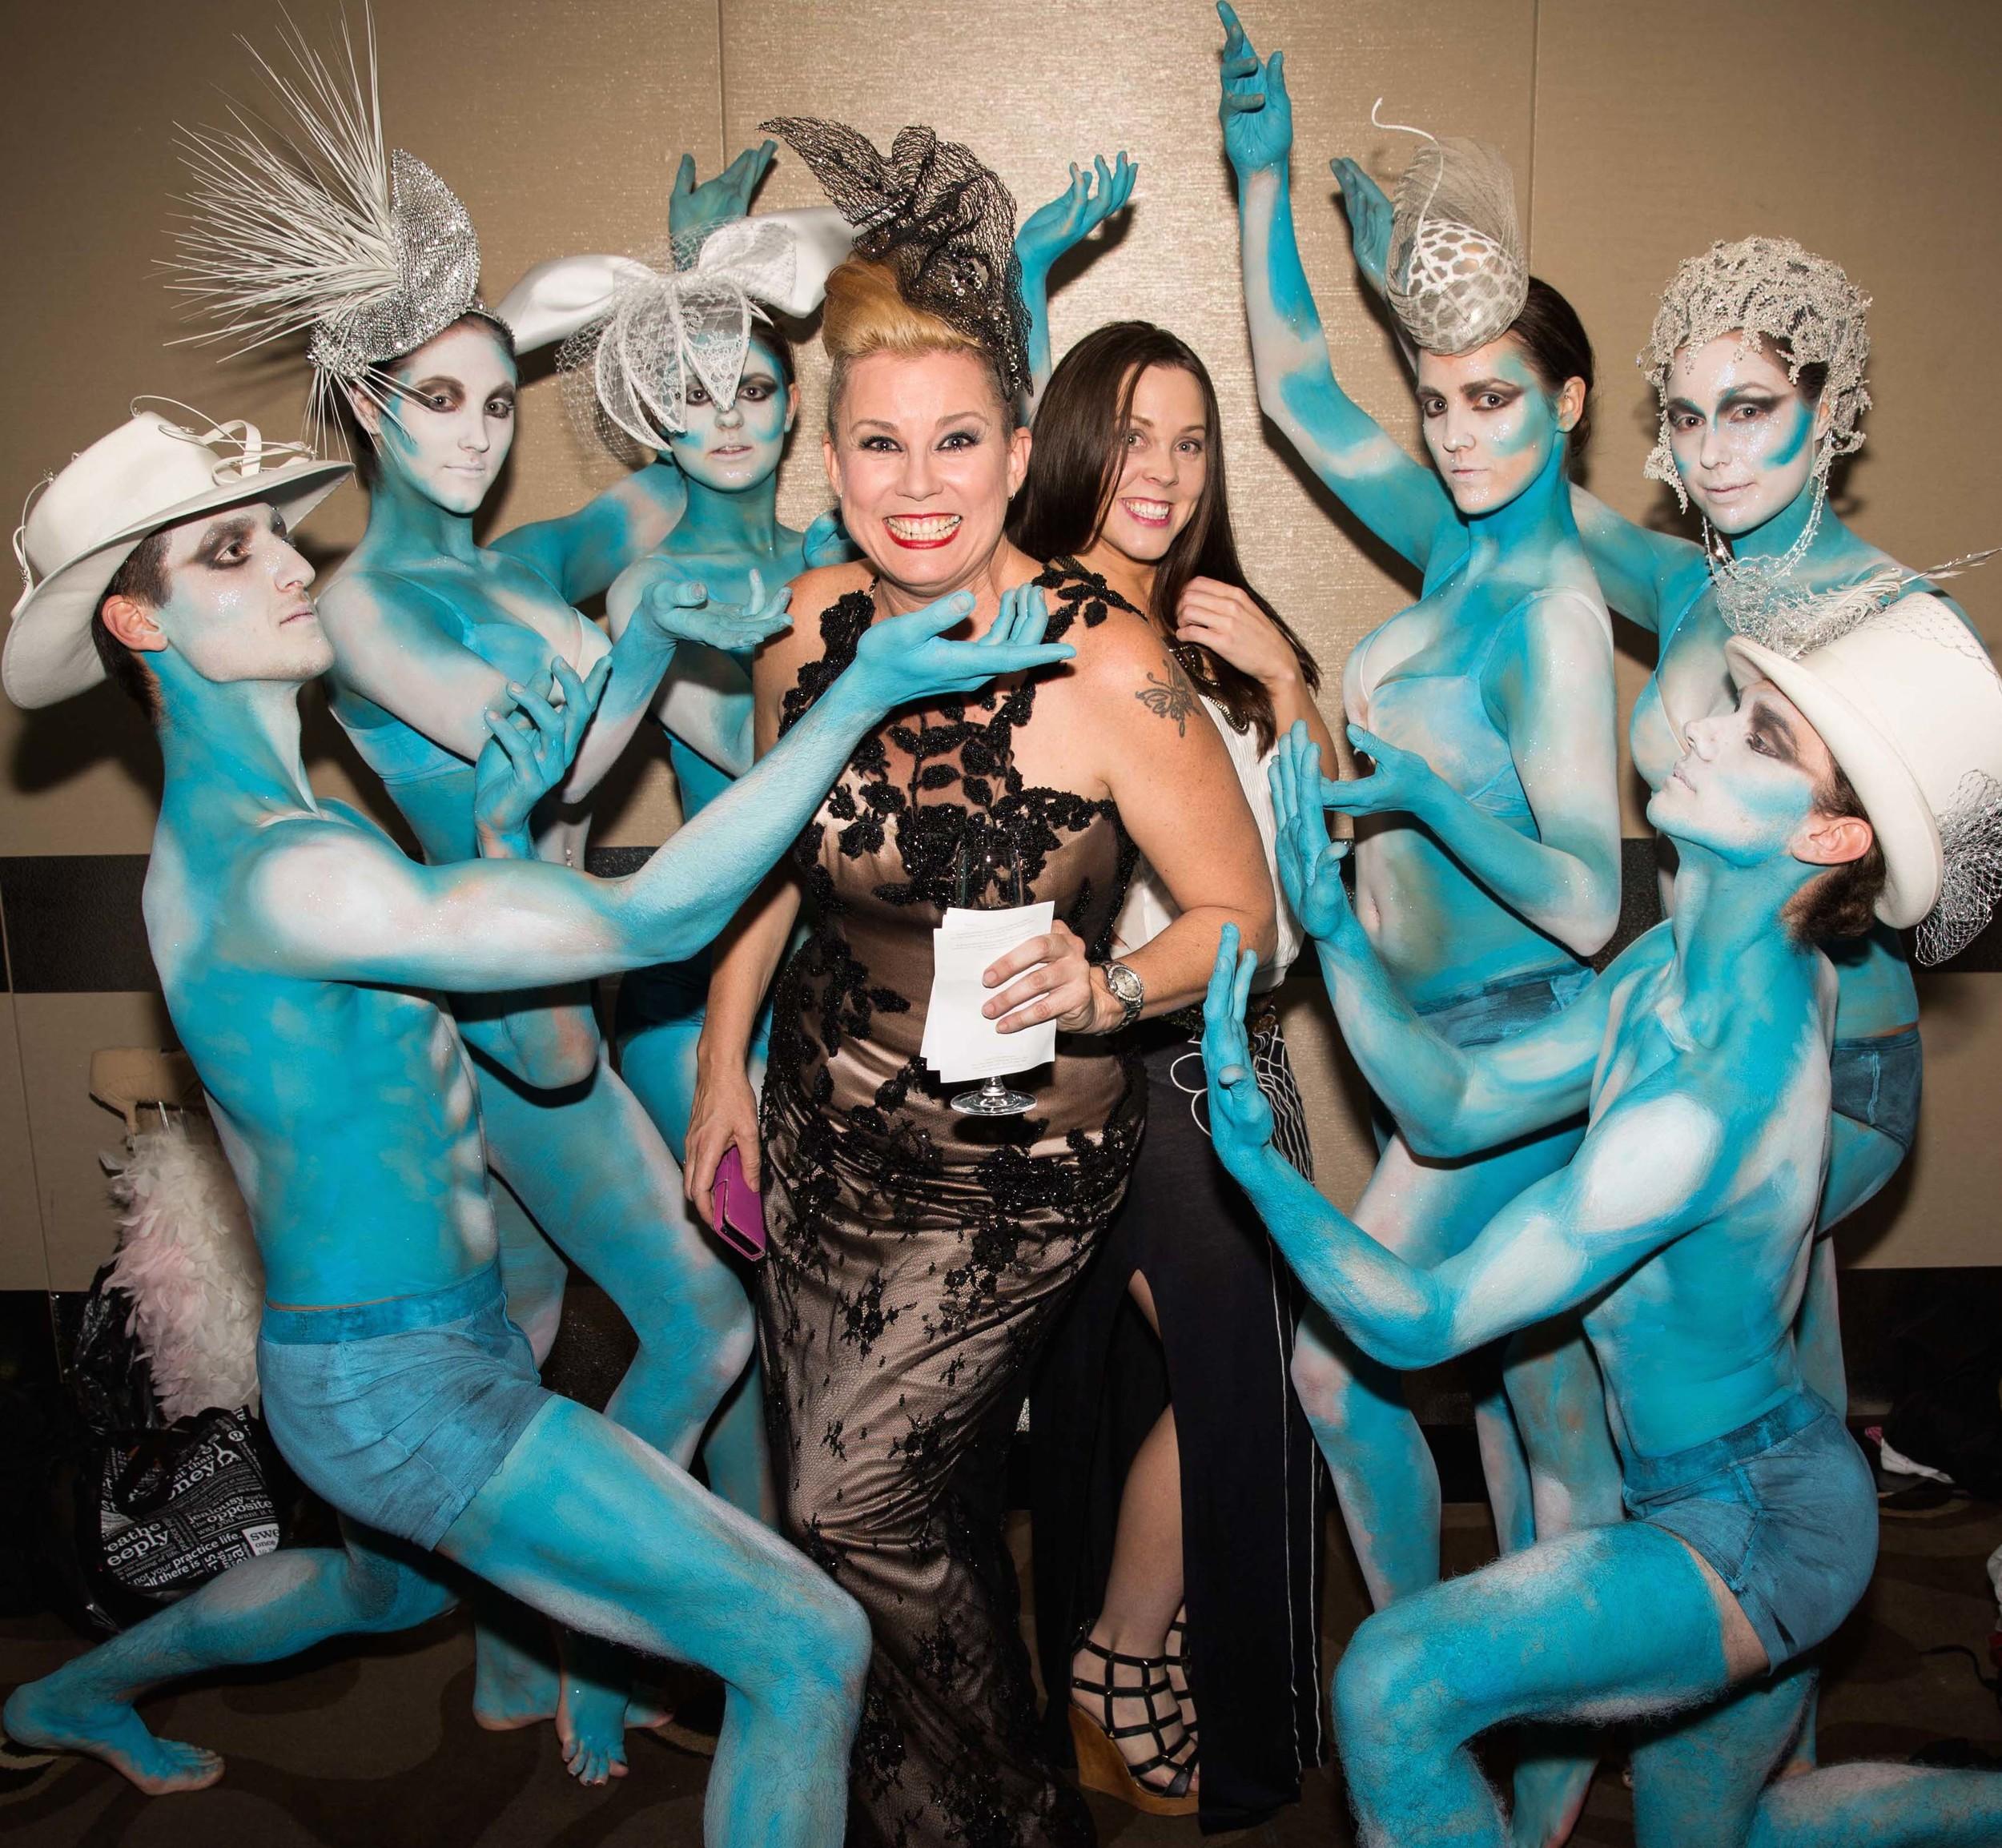 dancers and me.jpg